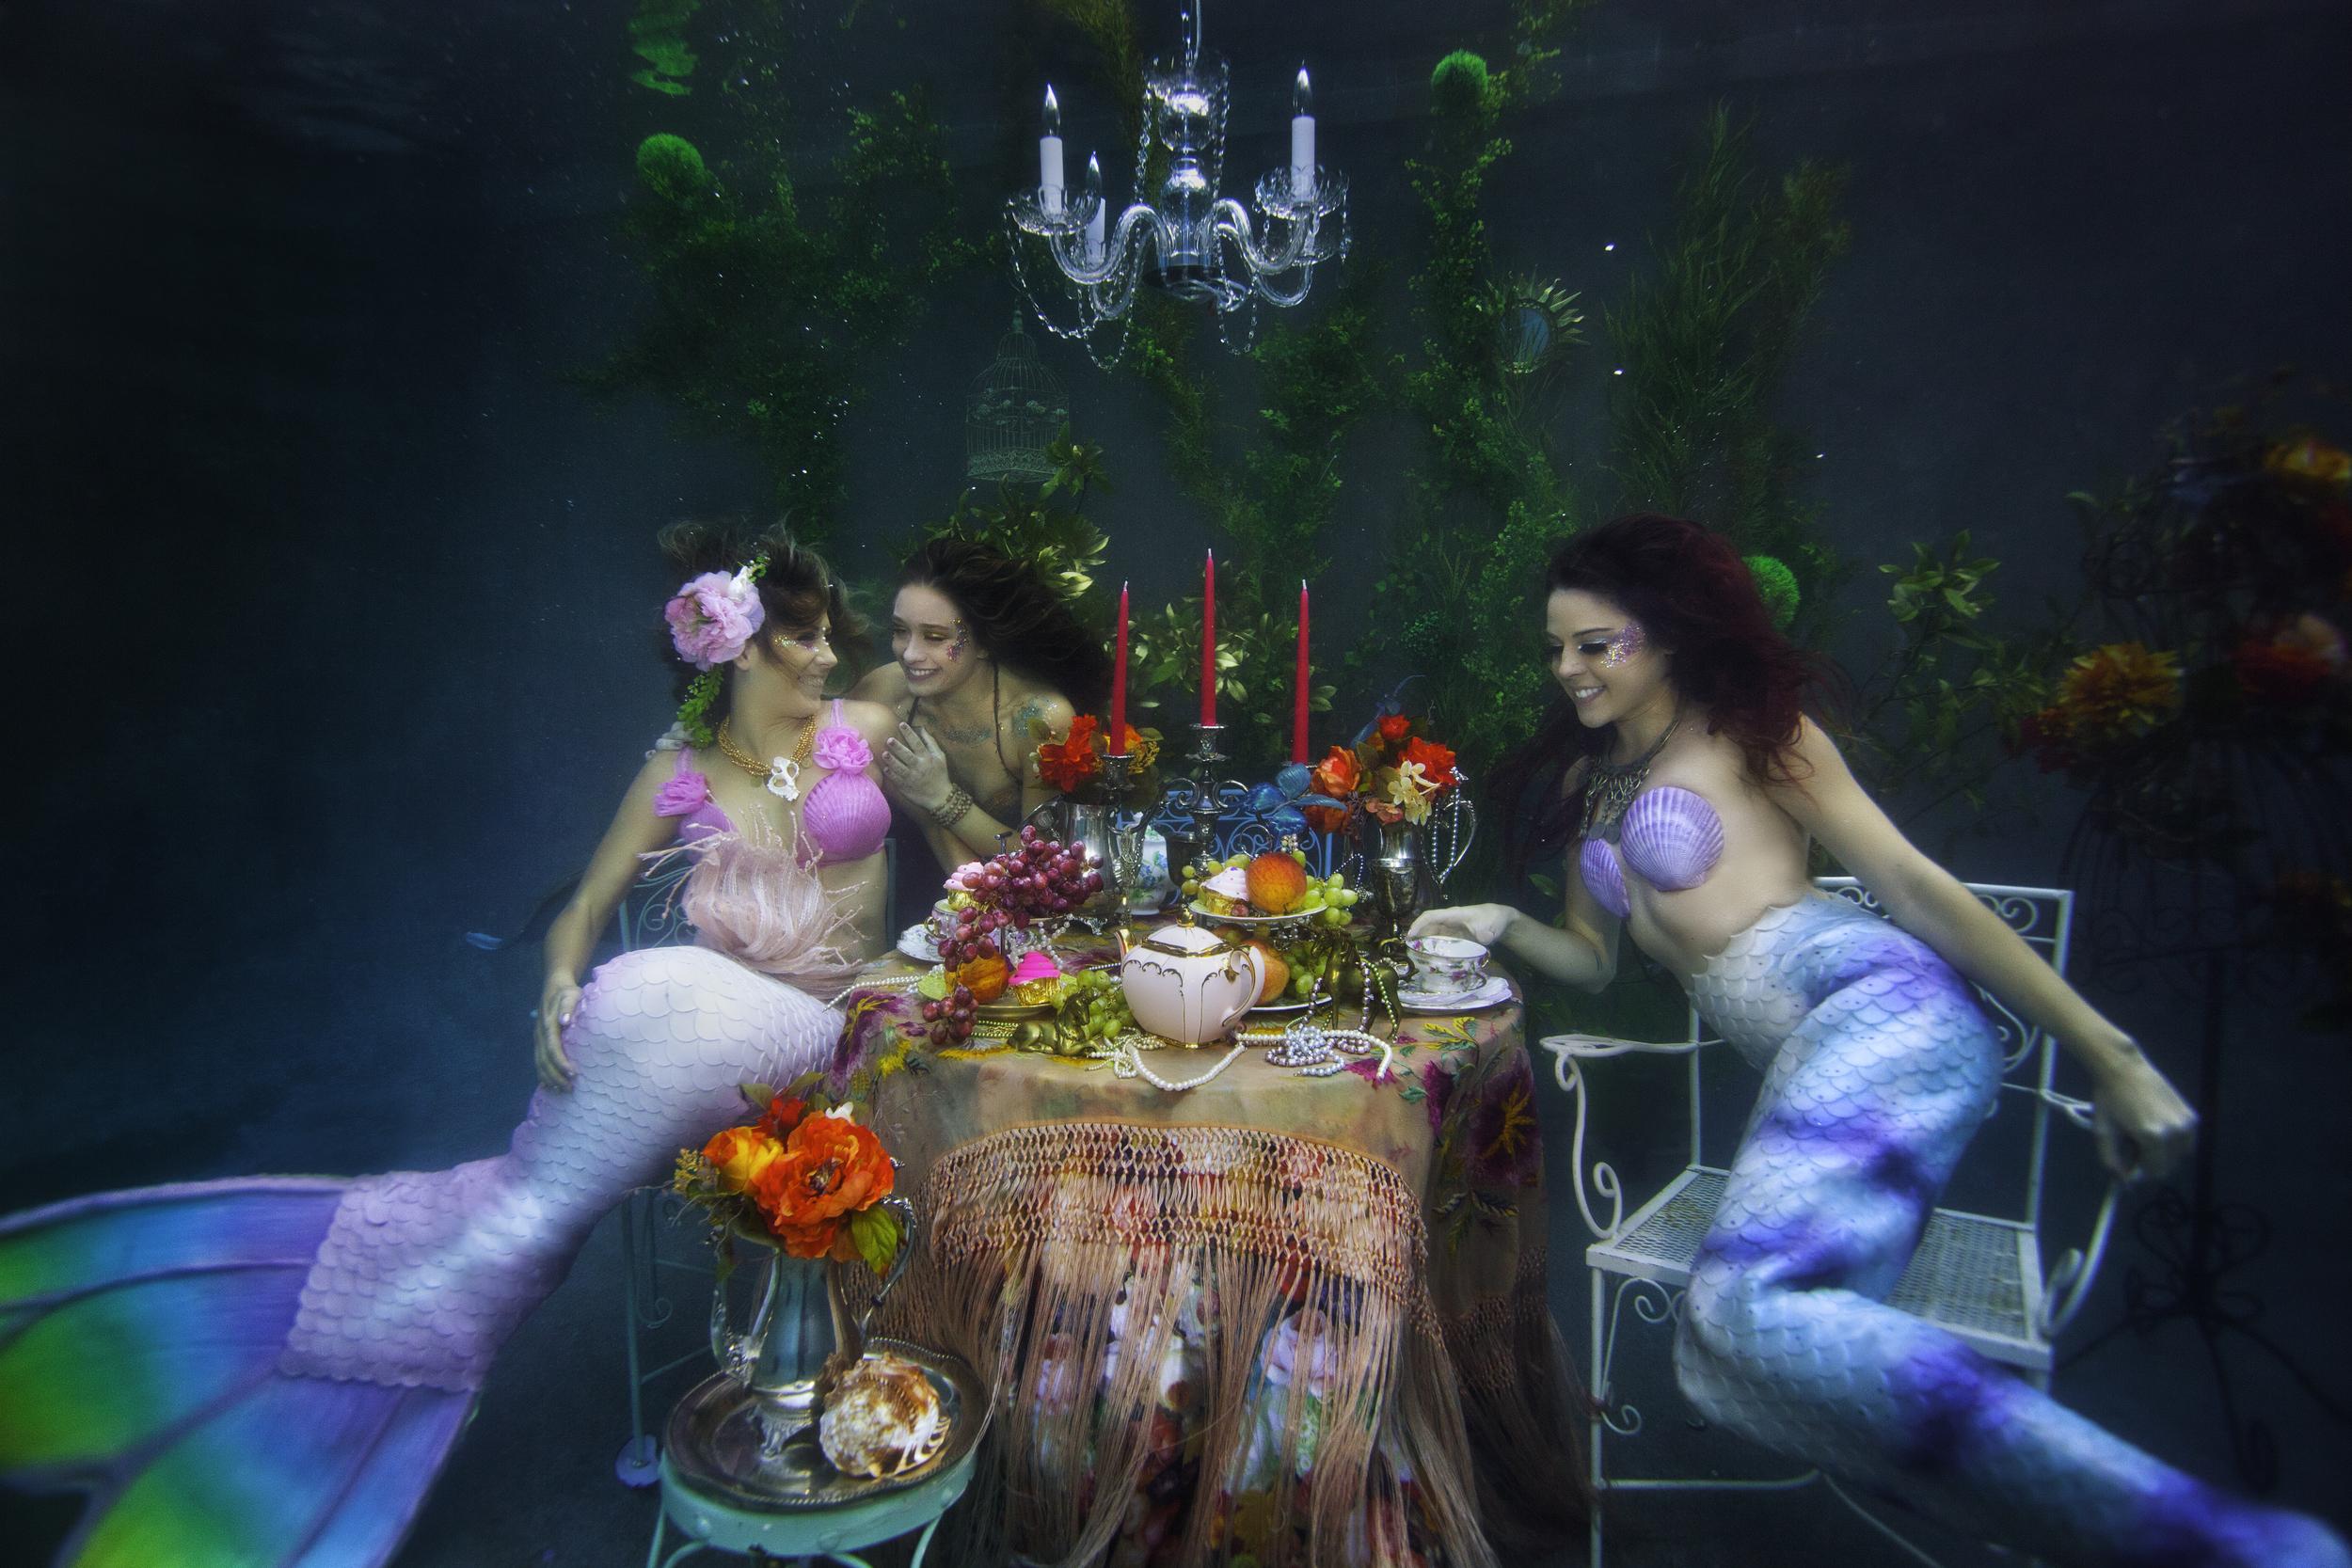 mermaidteaparty2-(ZF-0463-12796-1-009).jpg